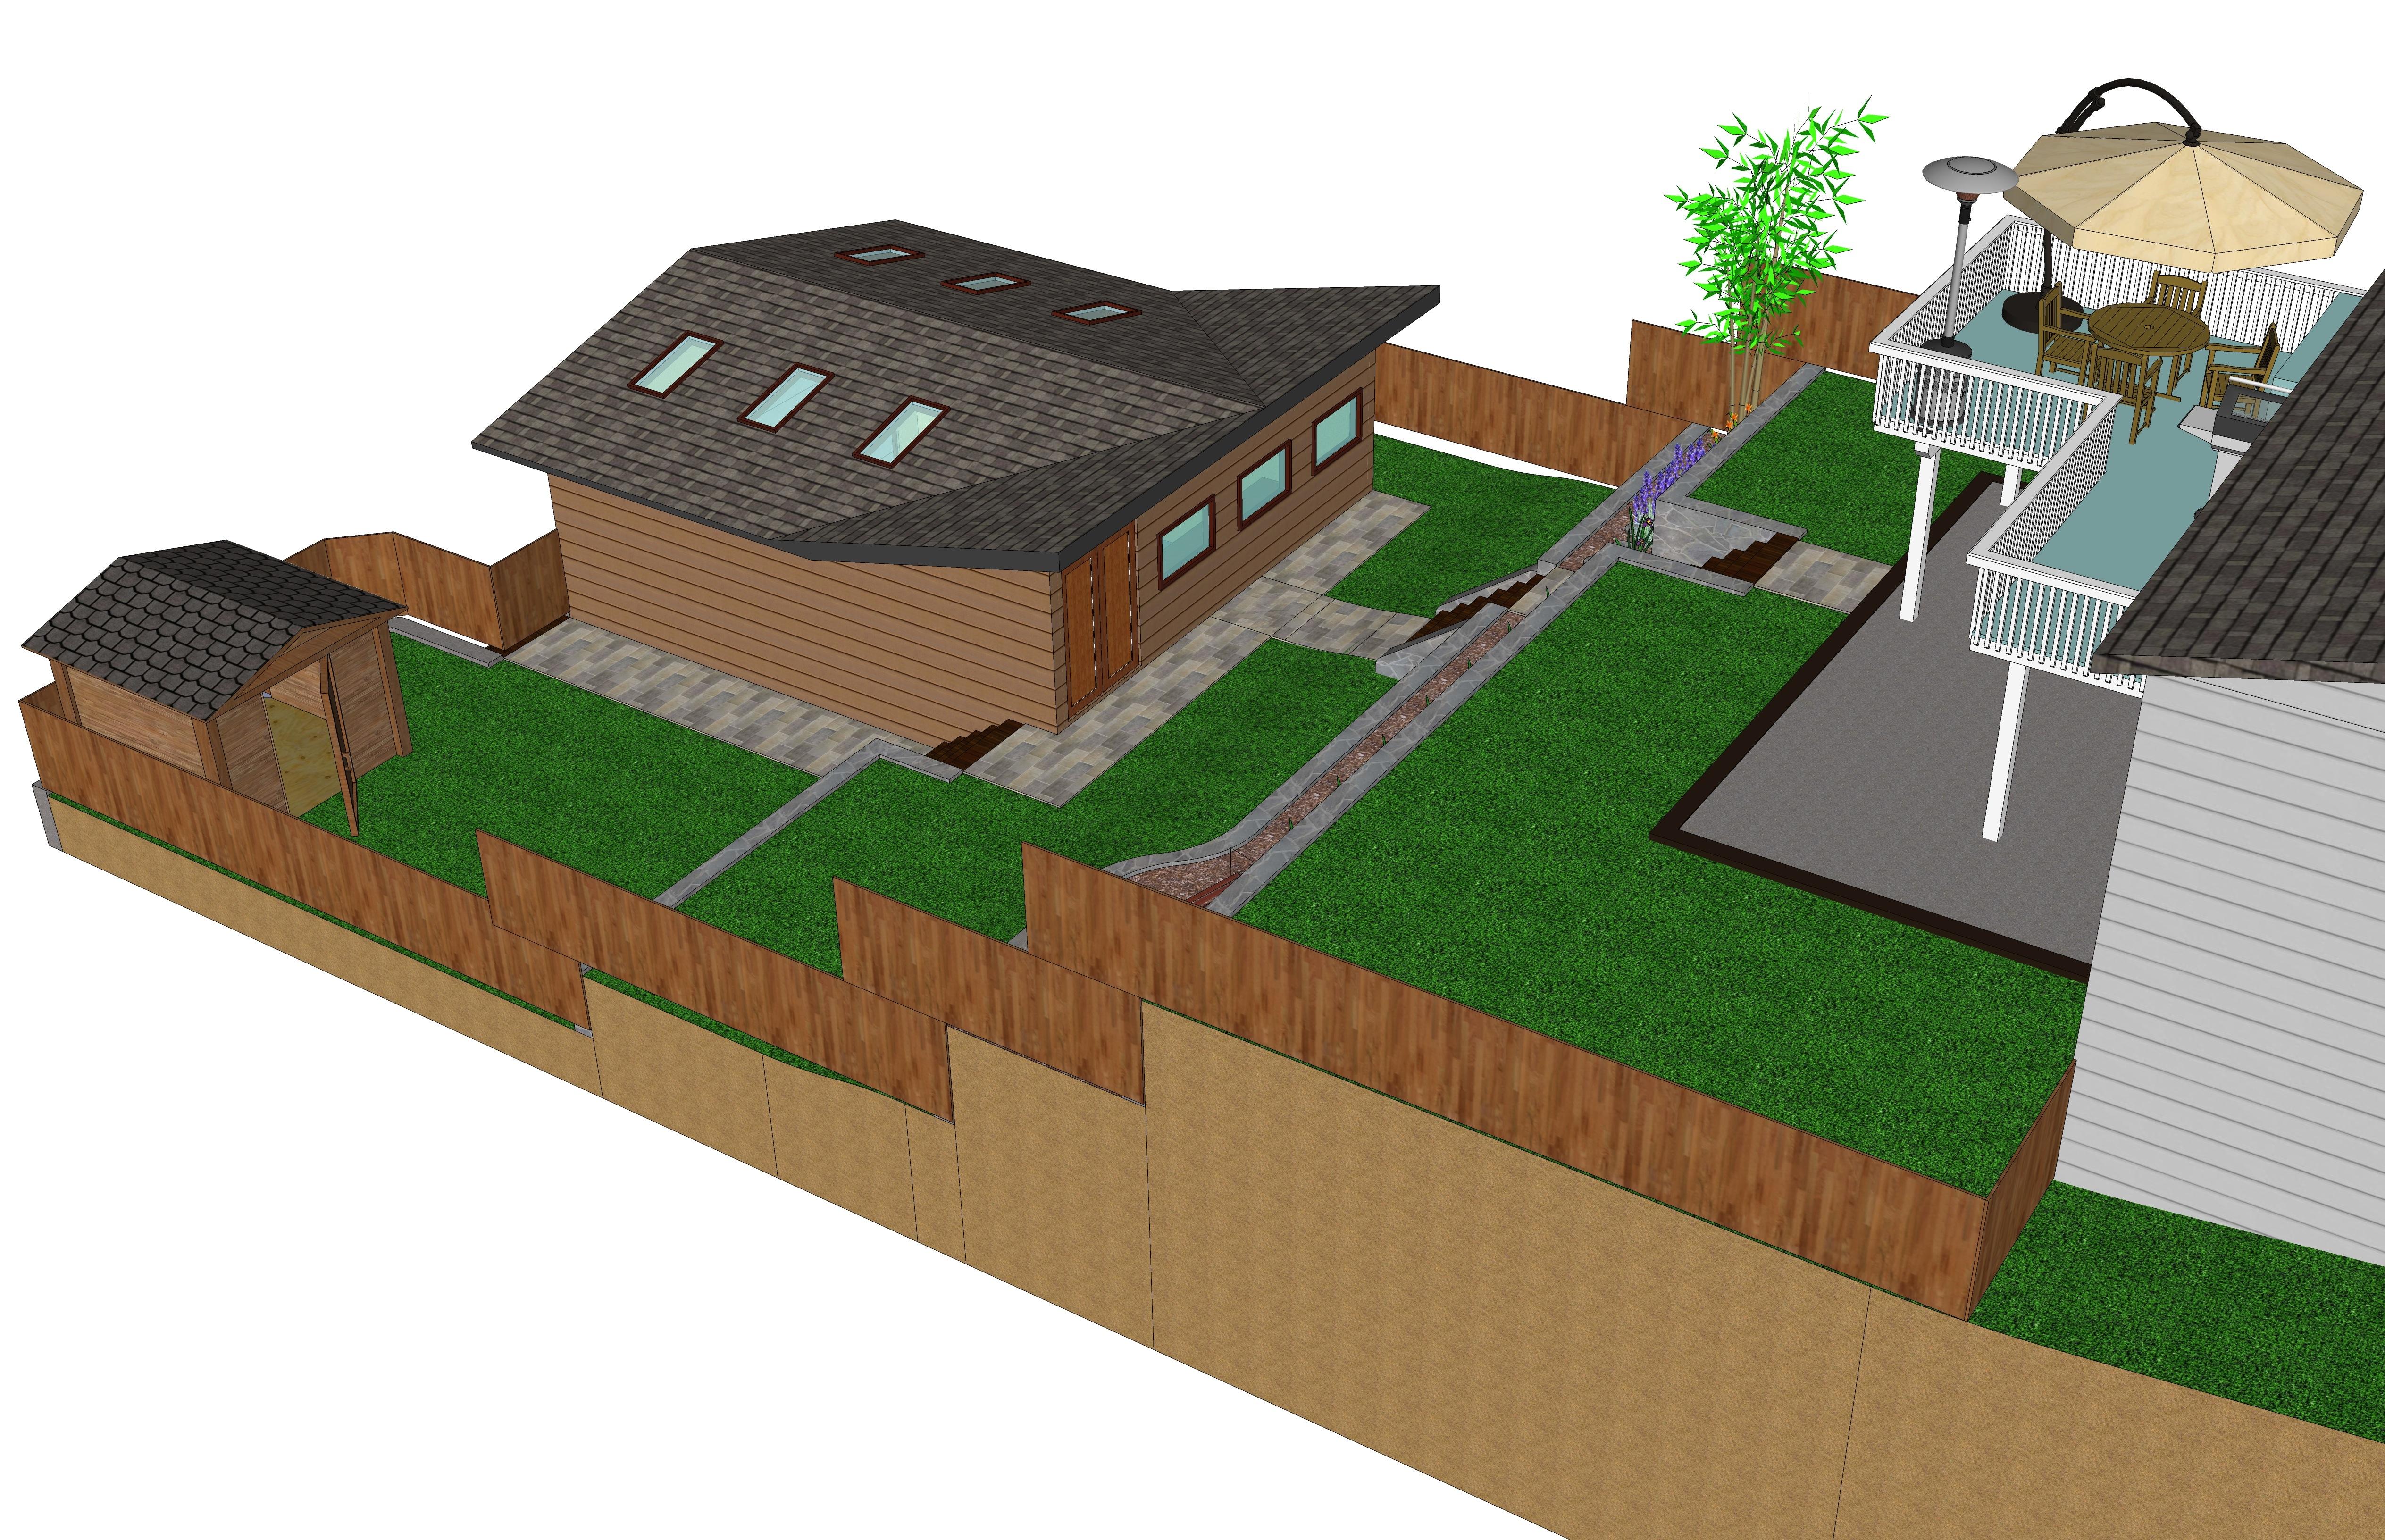 Concept Model in Sketchup